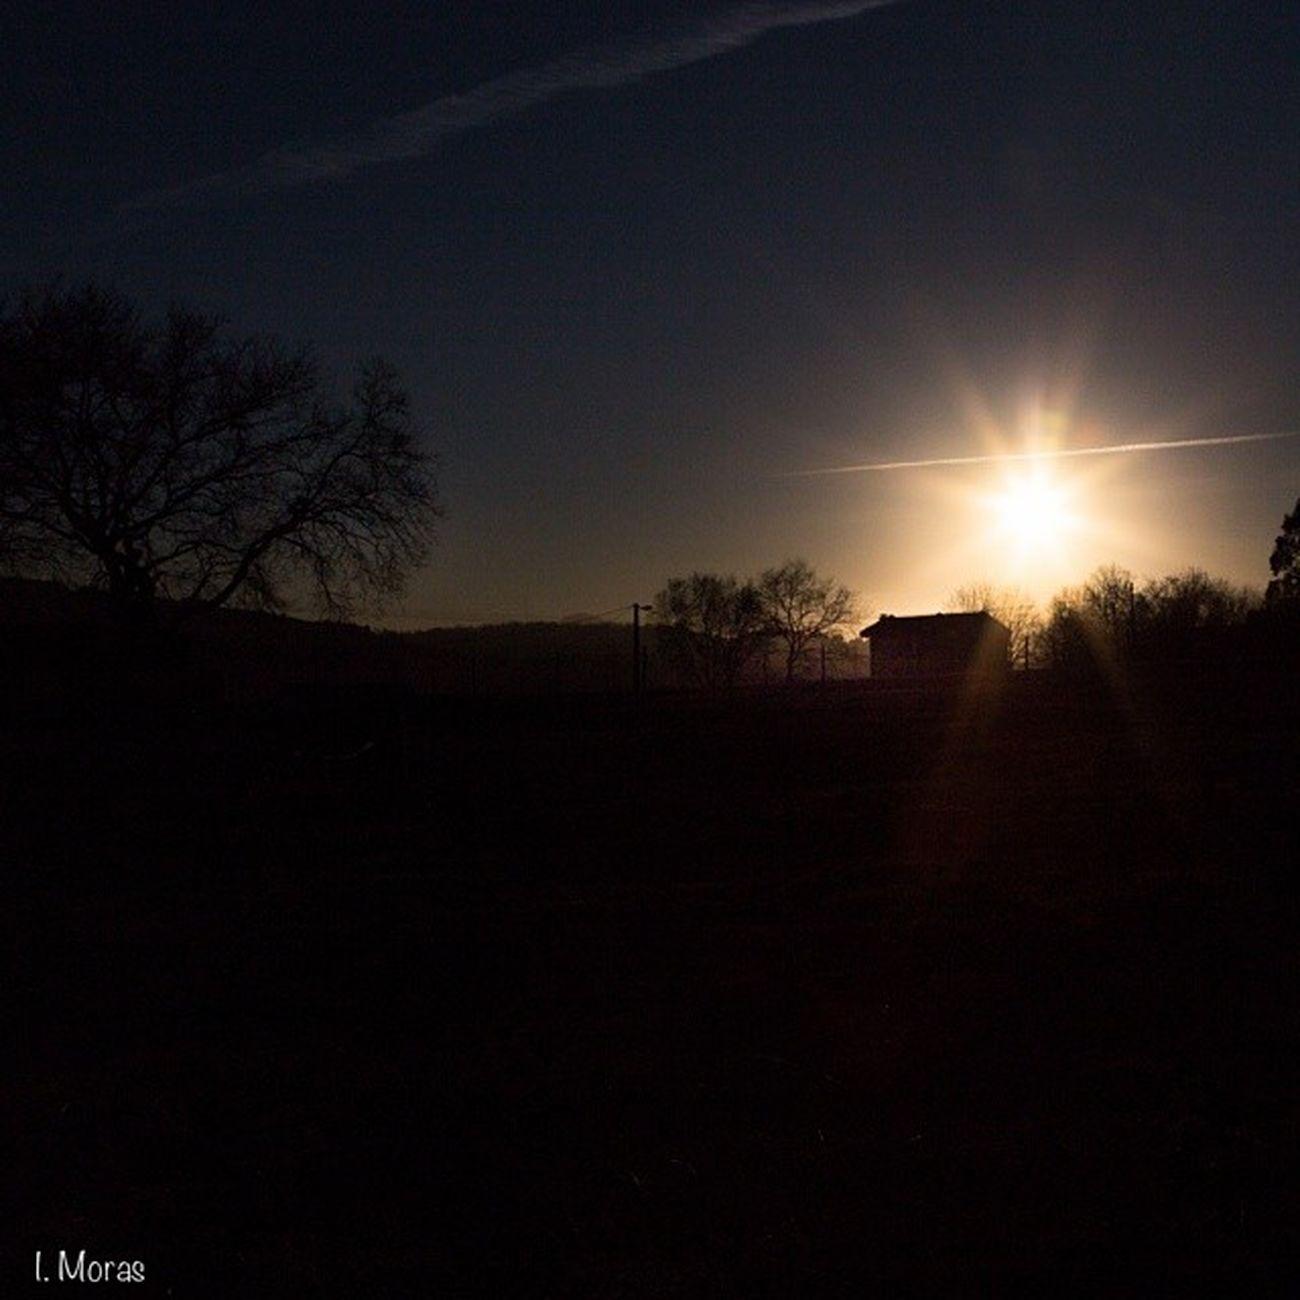 Sombras en la luz Zamudio  Sunset